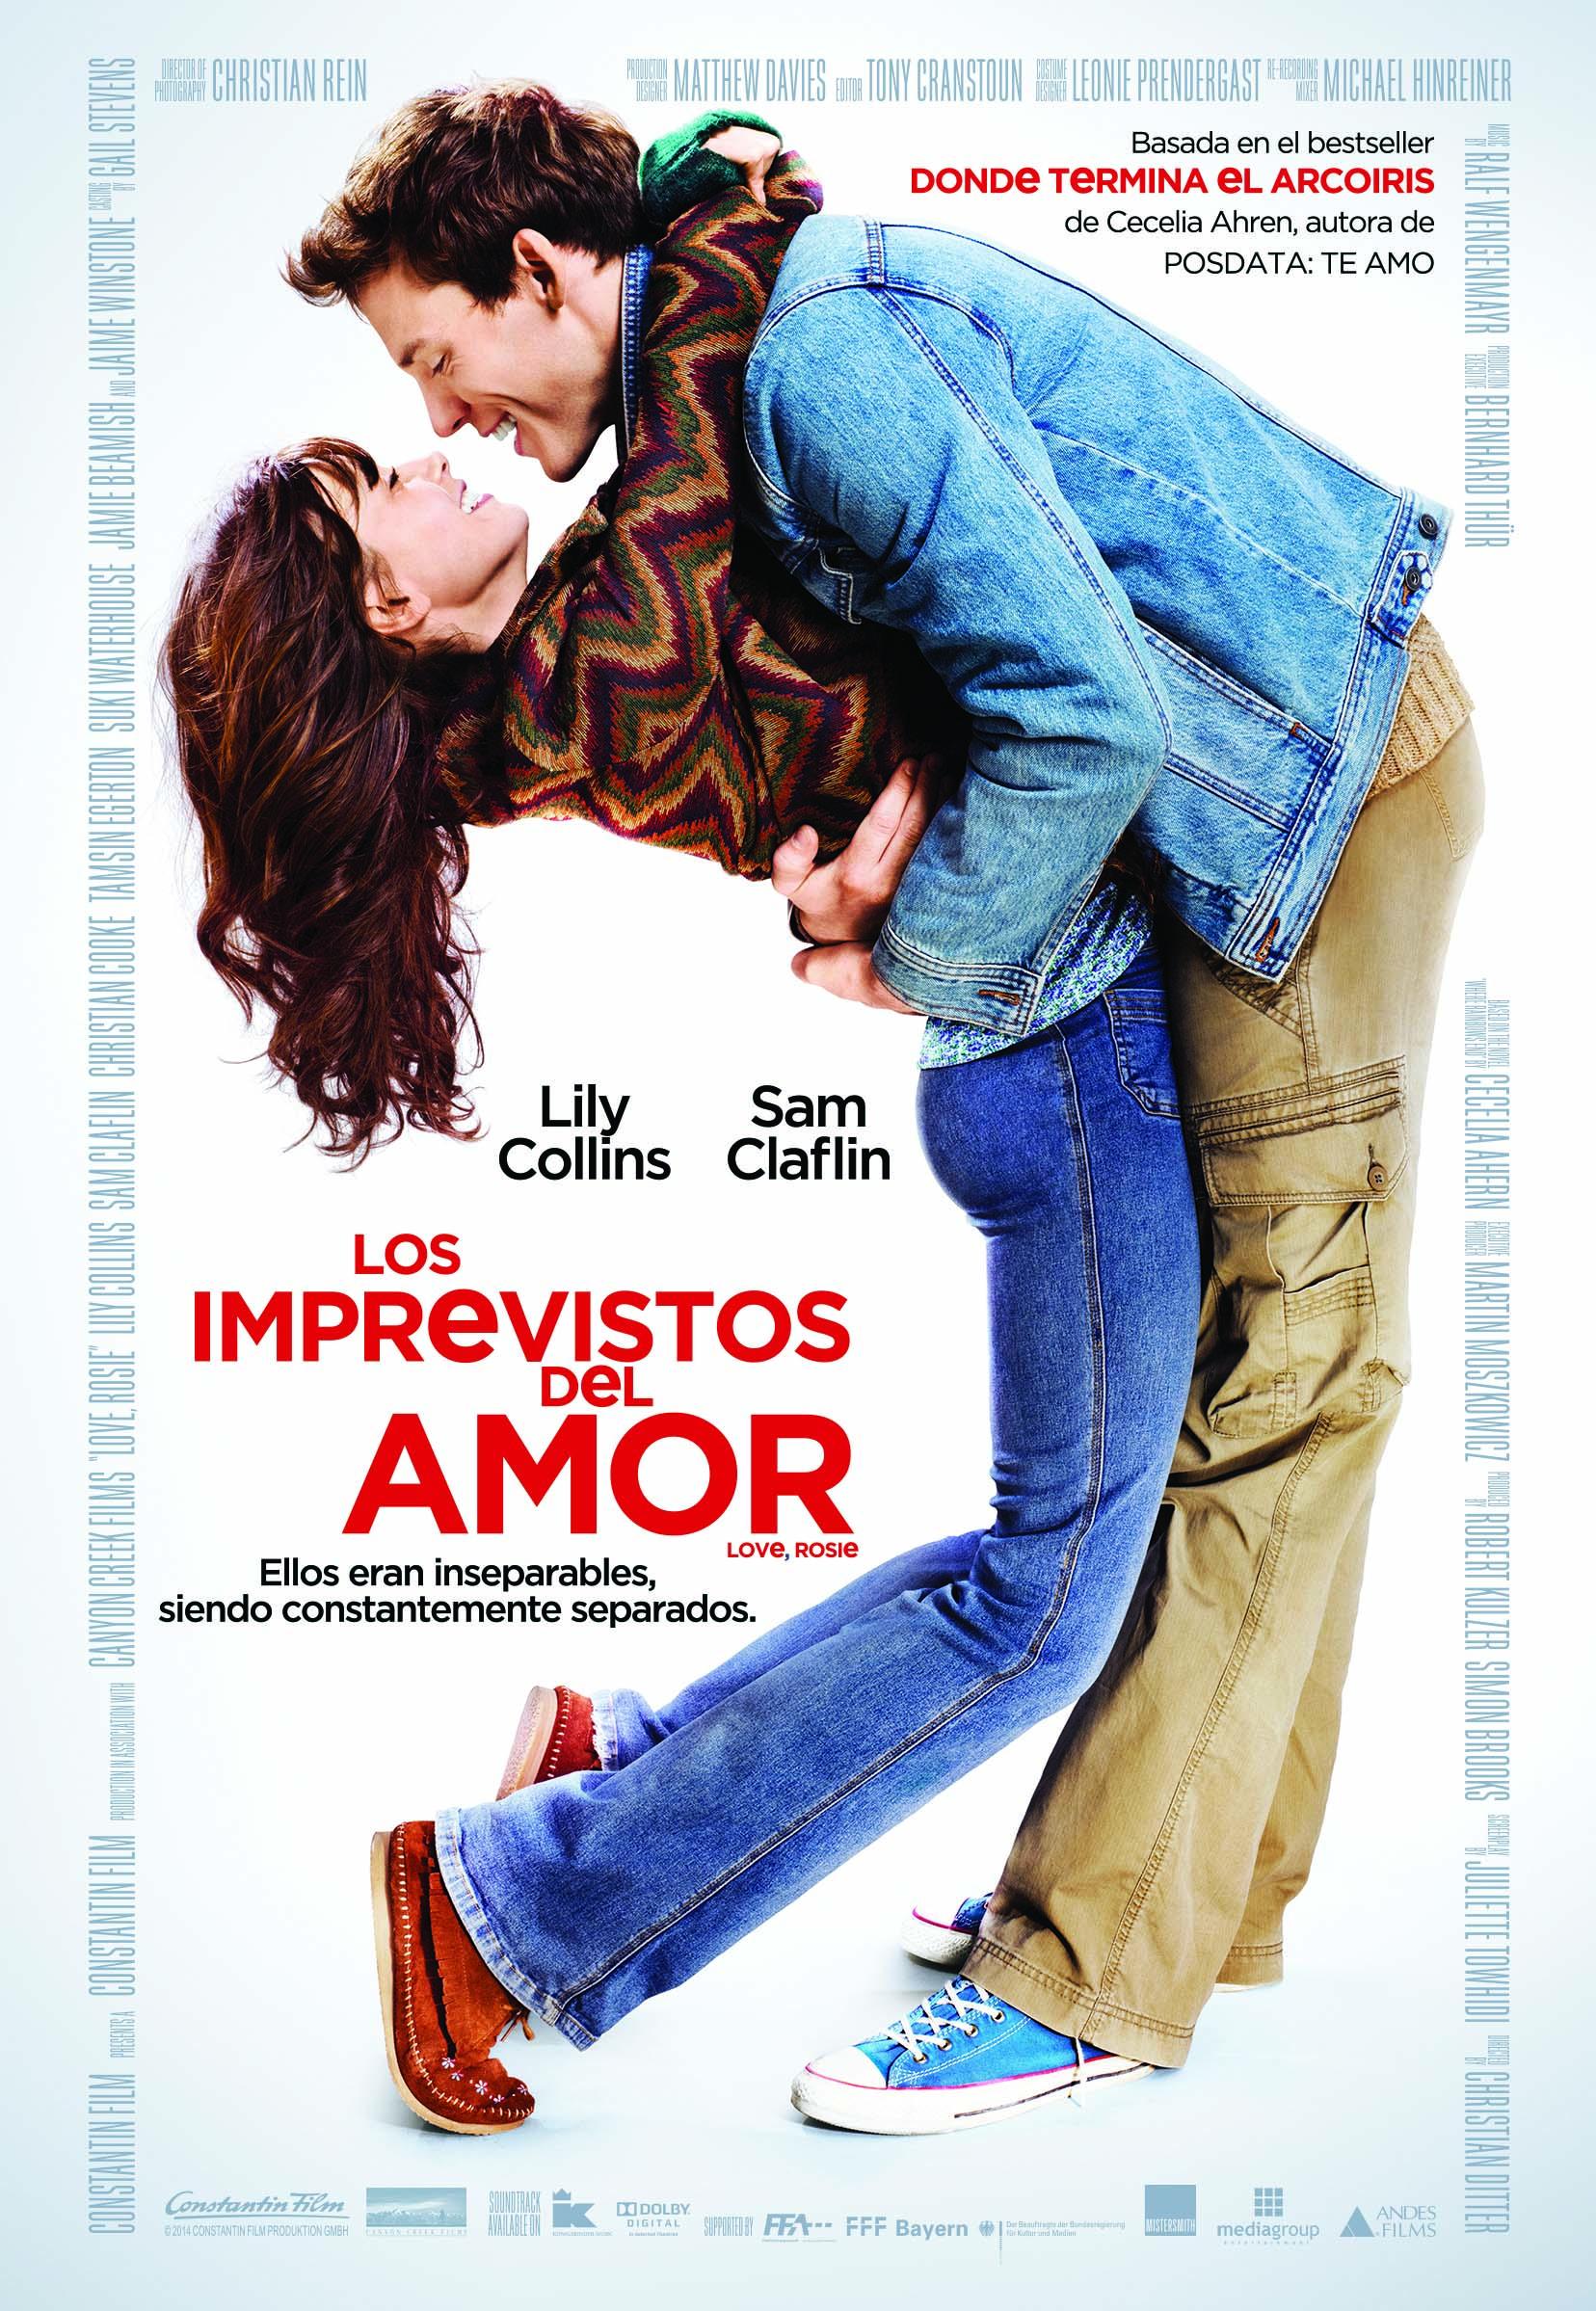 http://www.andesfilms.com.pe/imprevistos-del-amor/